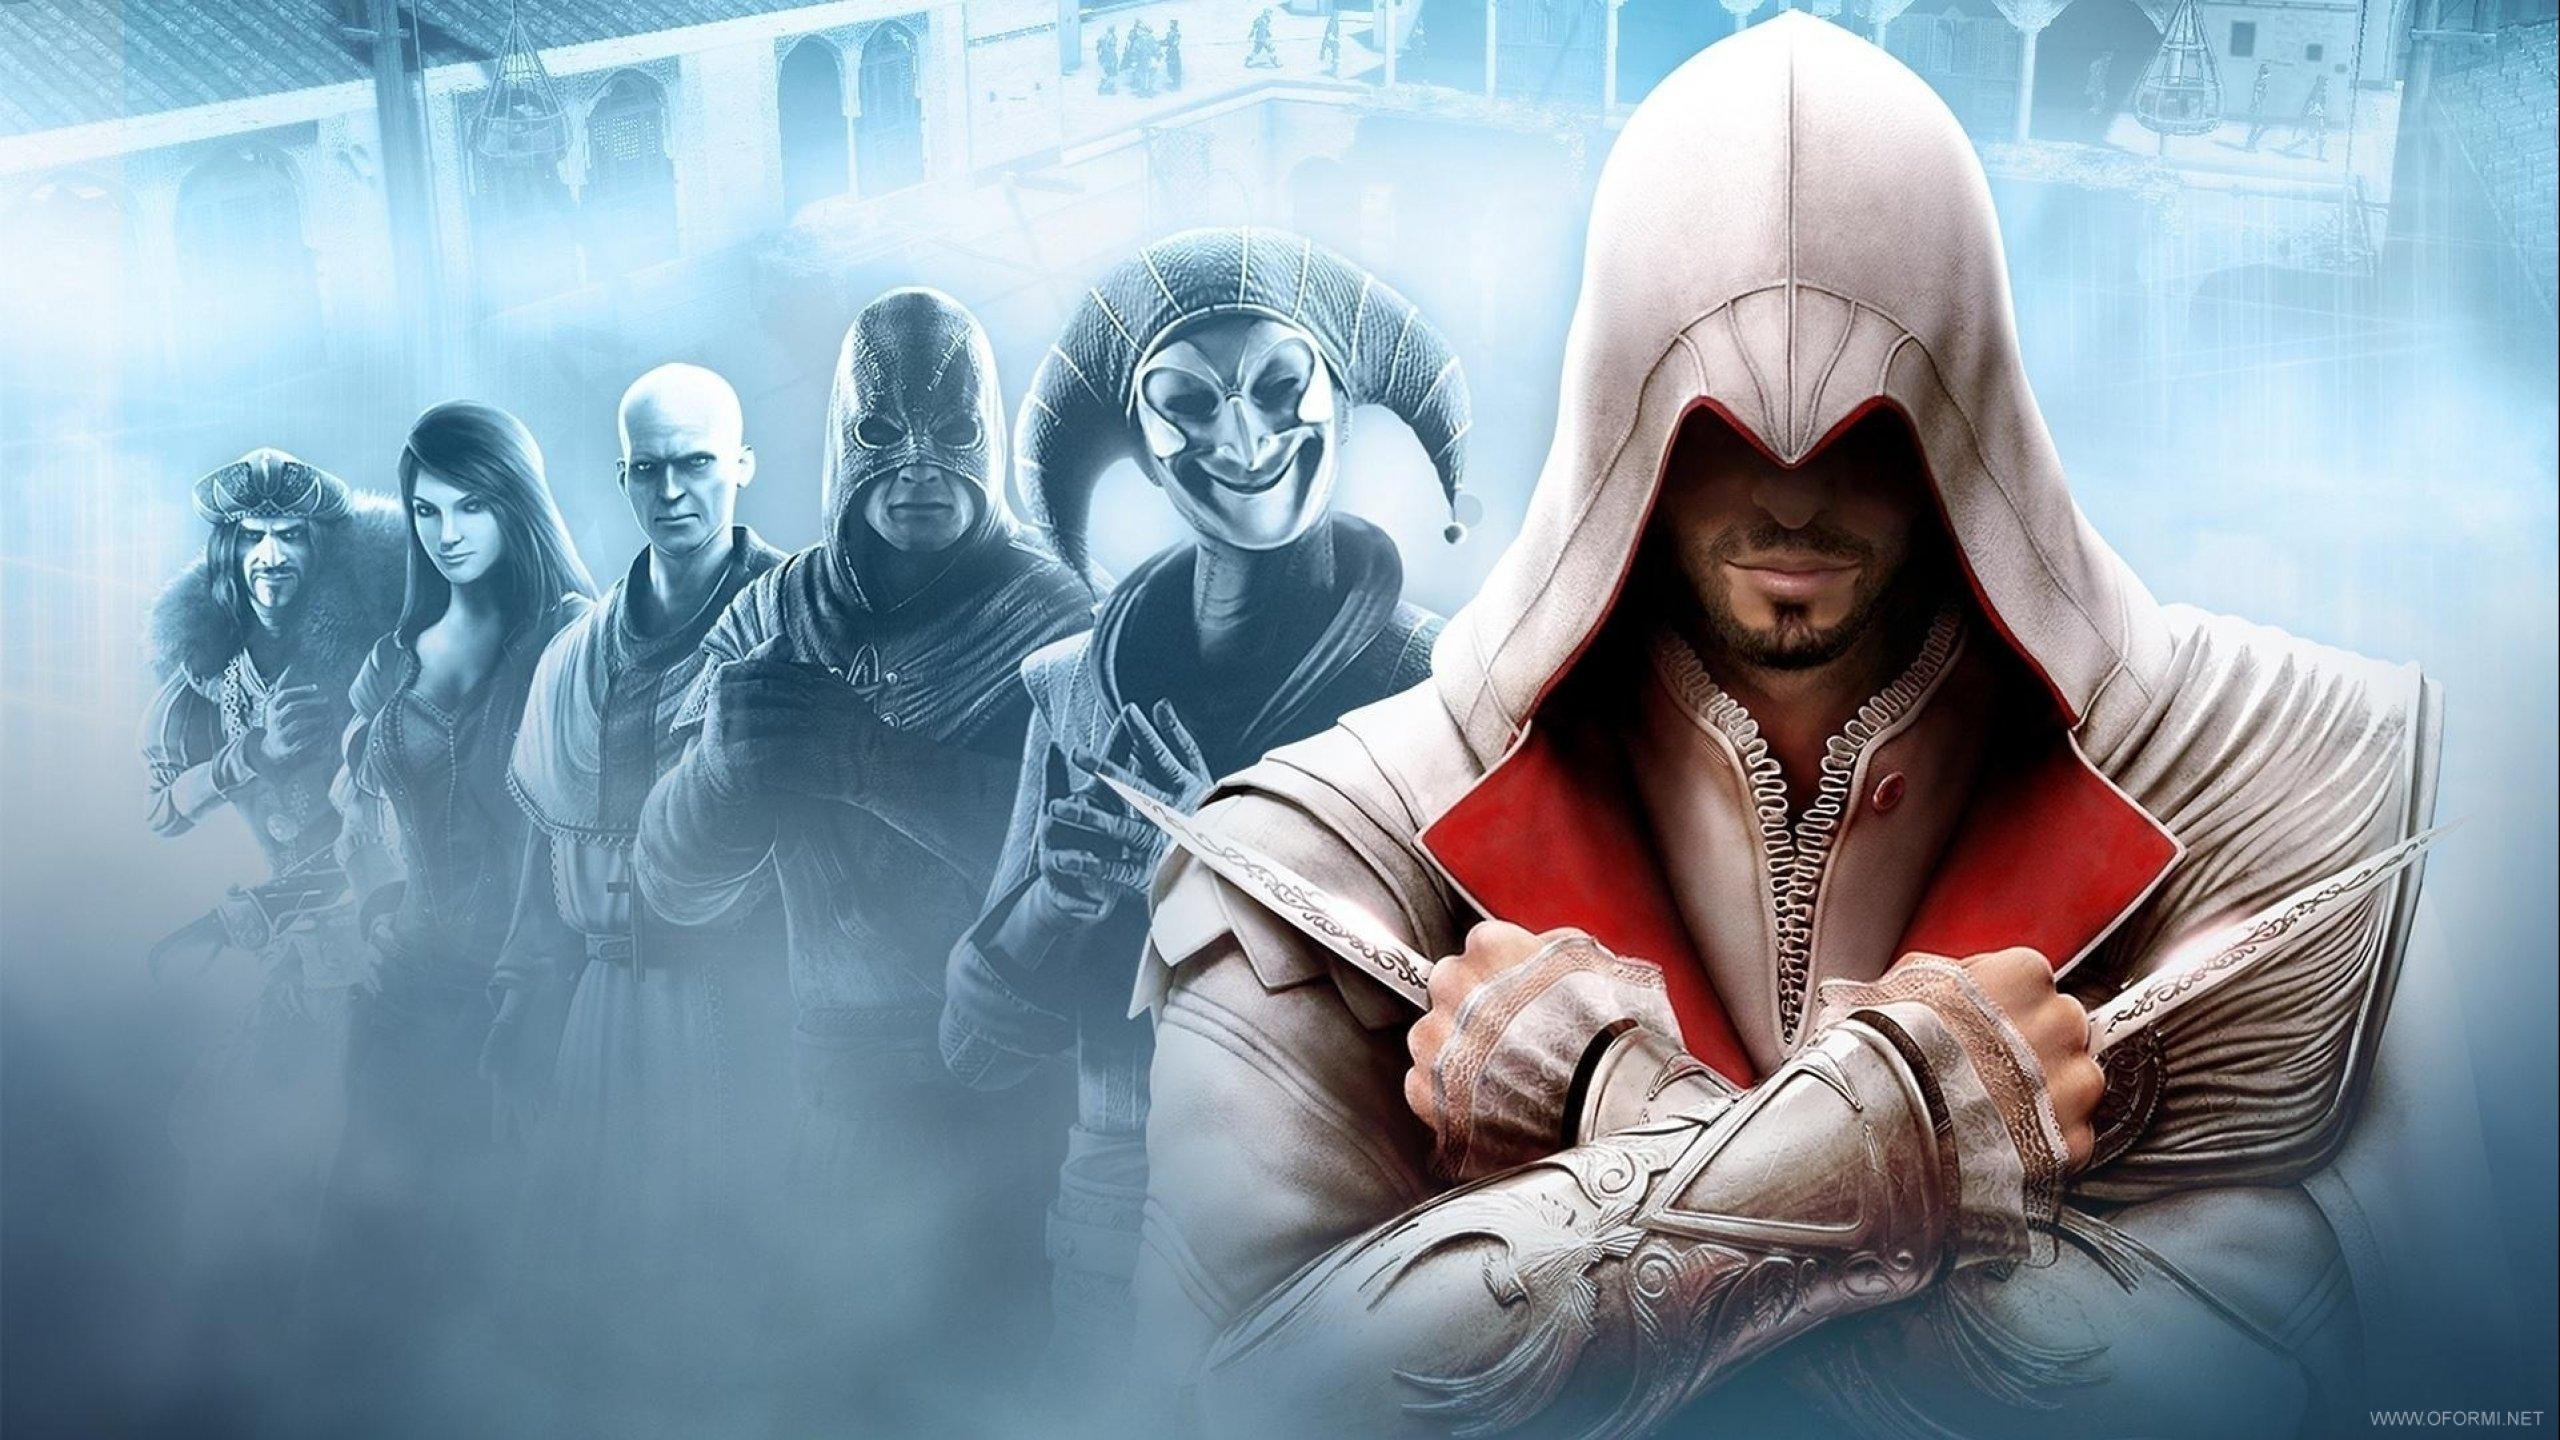 Assassins Creed Brotherhood Fondo De Pantalla Hd Fondo